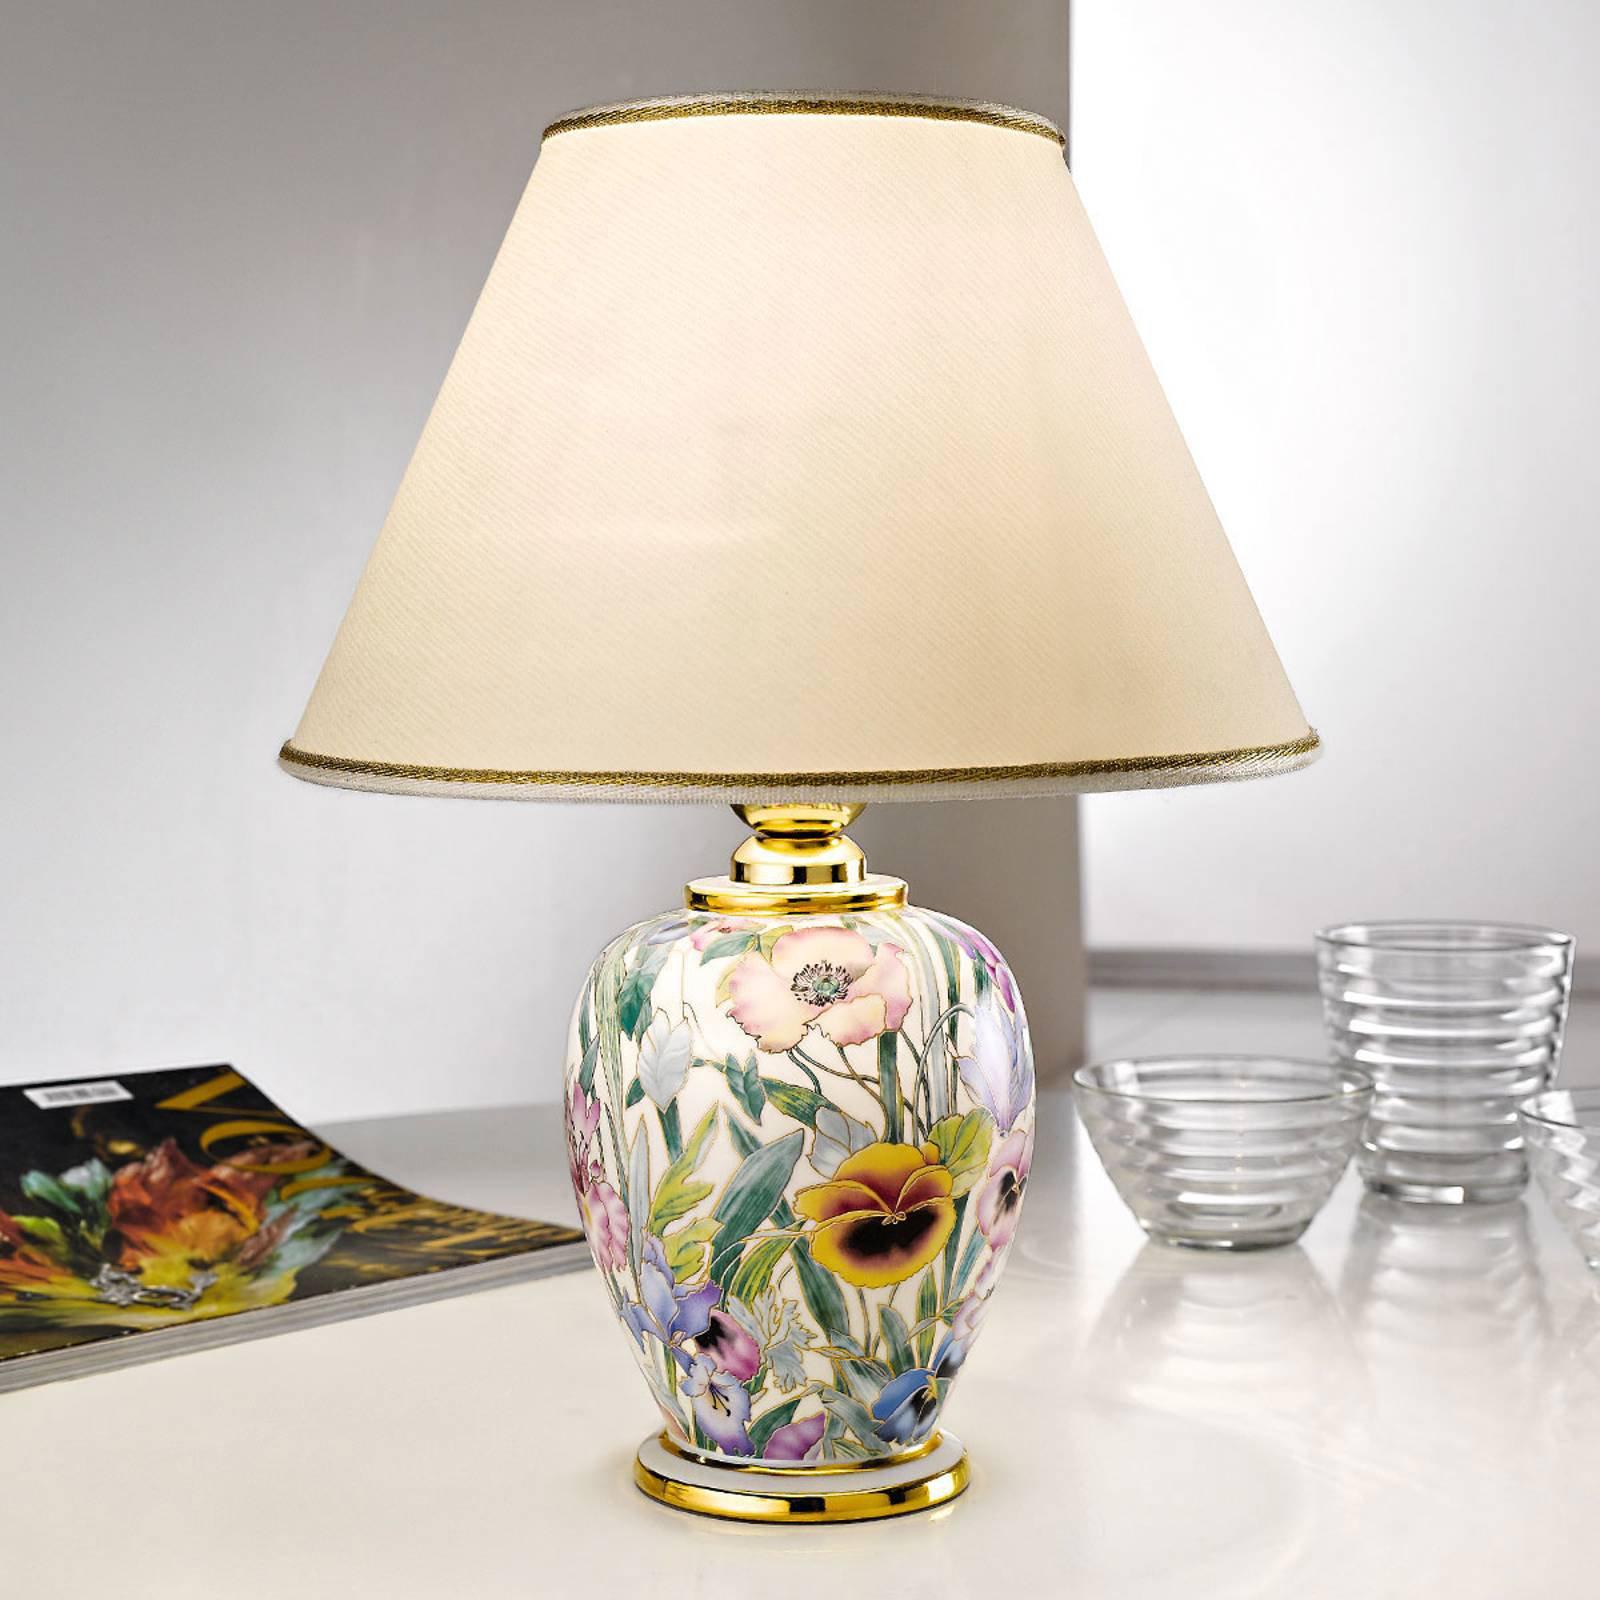 Bordlampe Giardino Panse, blomstertrykk, Ø 25 cm